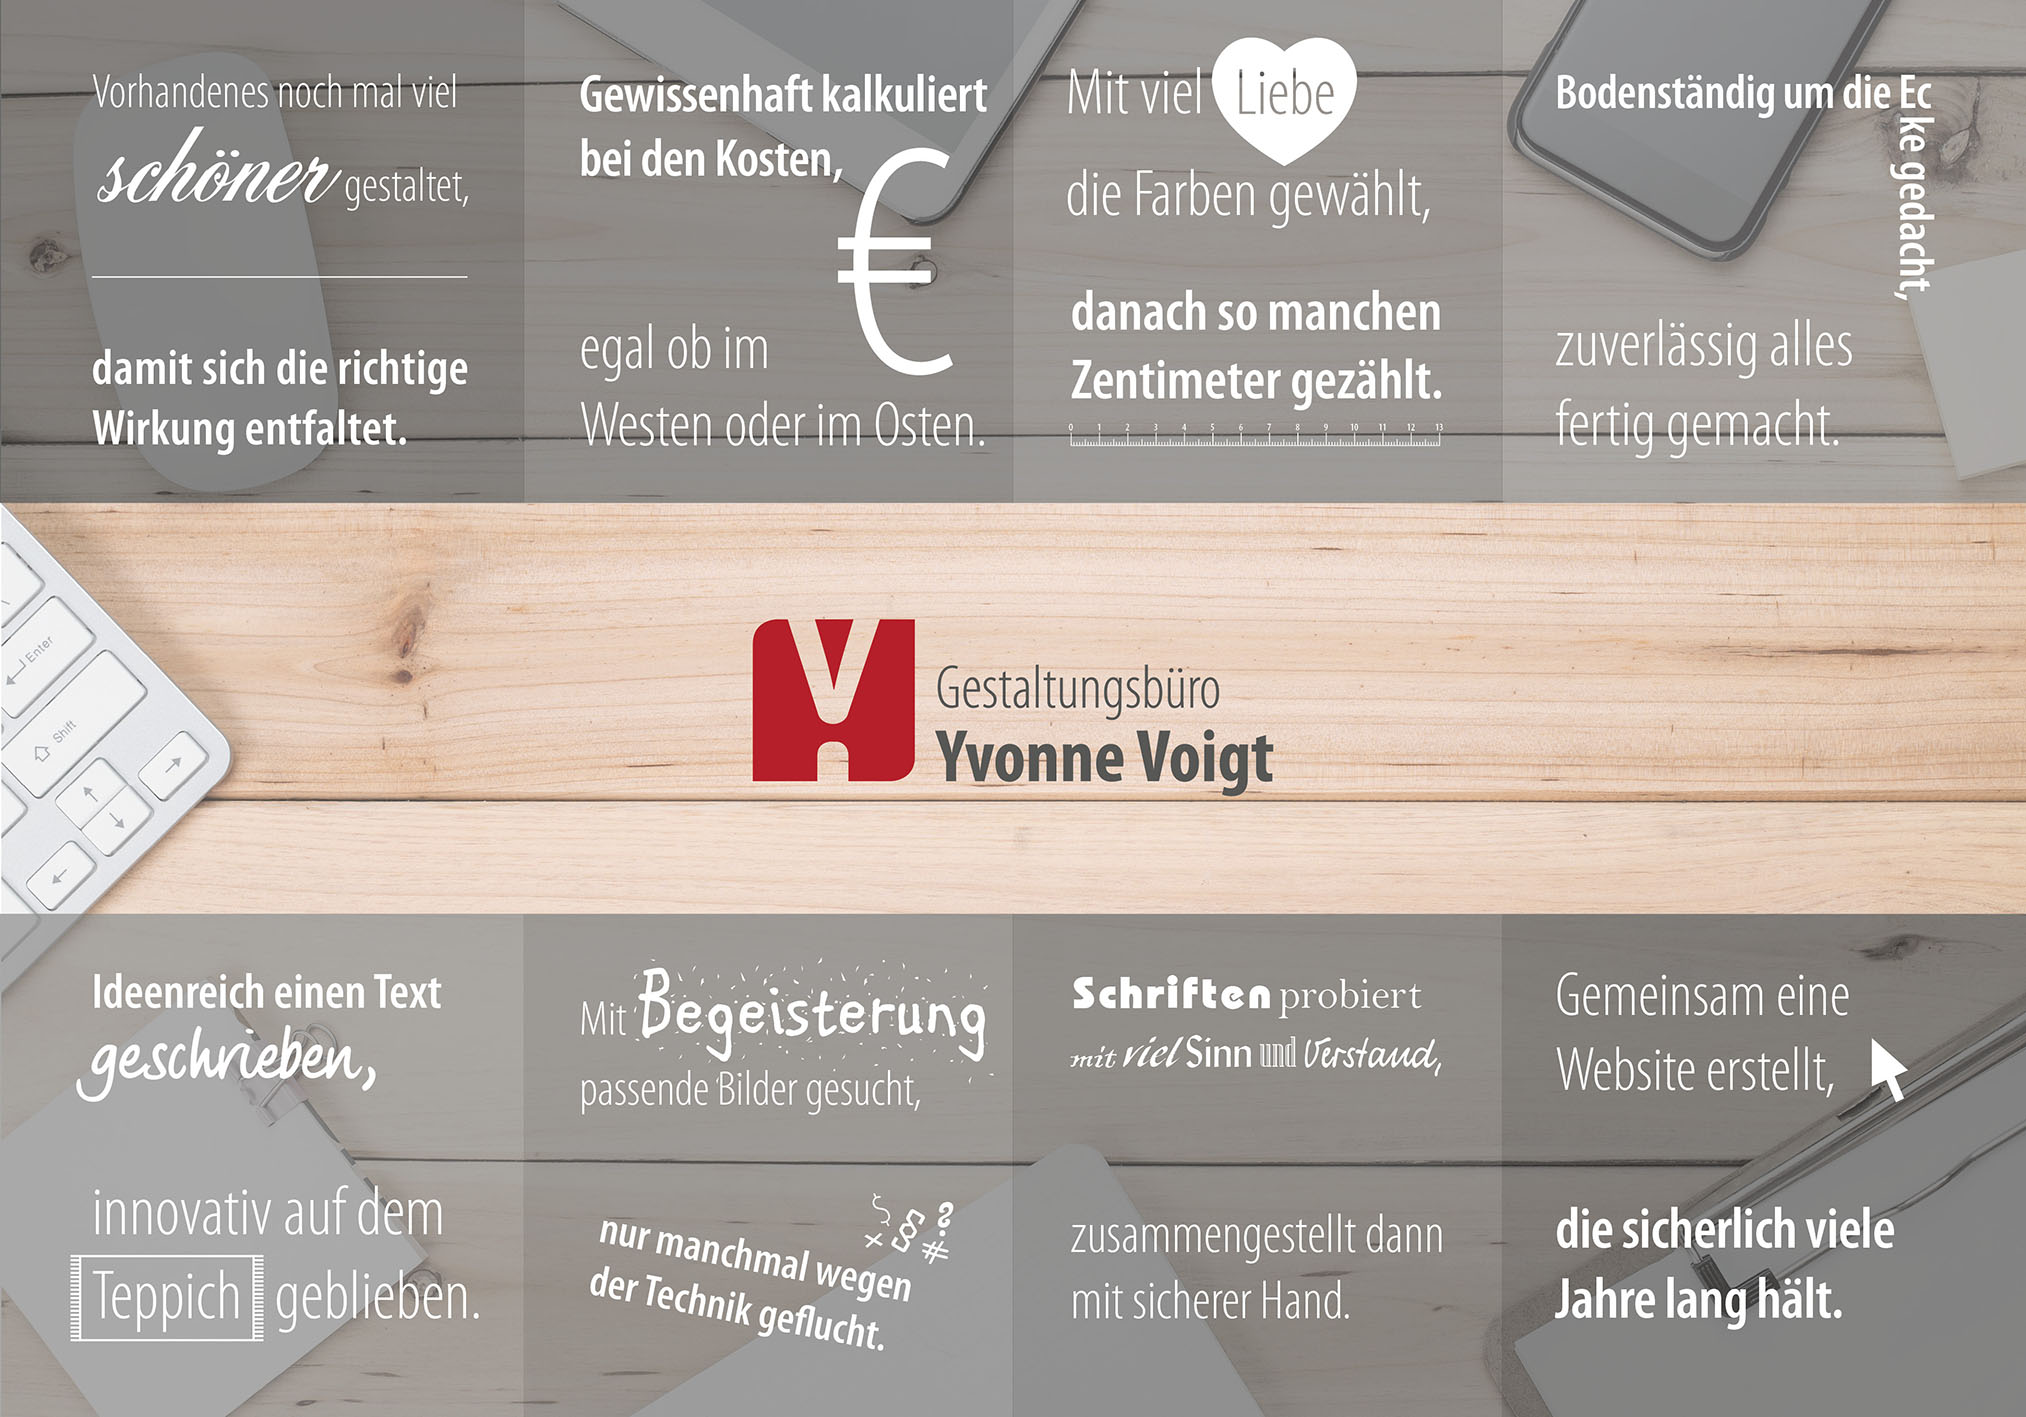 Poster Gestaltungsbüro Yvonne Voigt